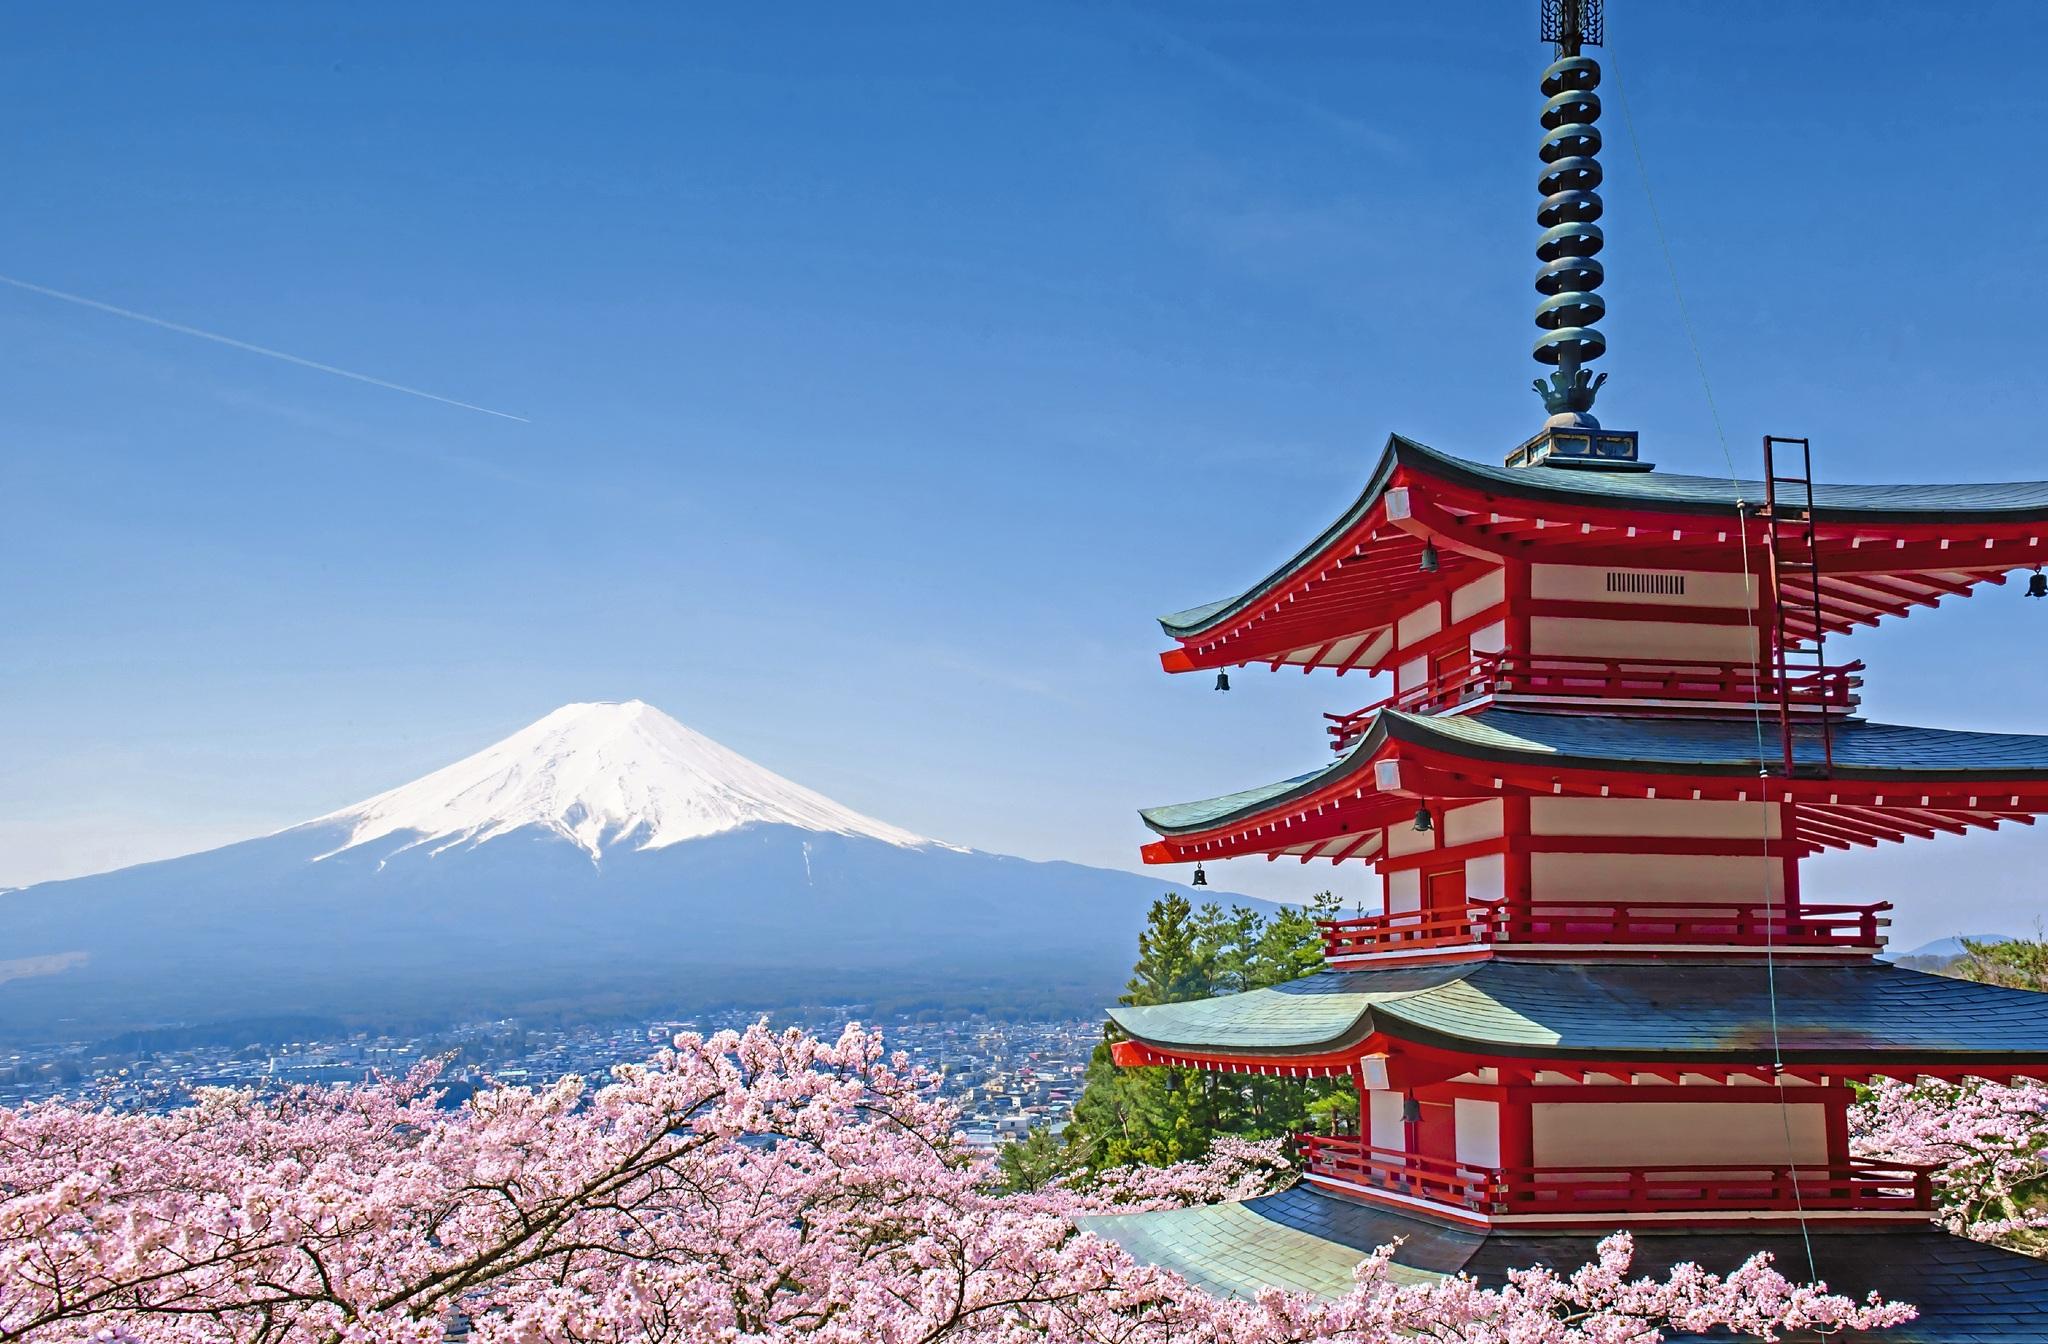 Vulkan Fuji in der Kirschblütenzeit